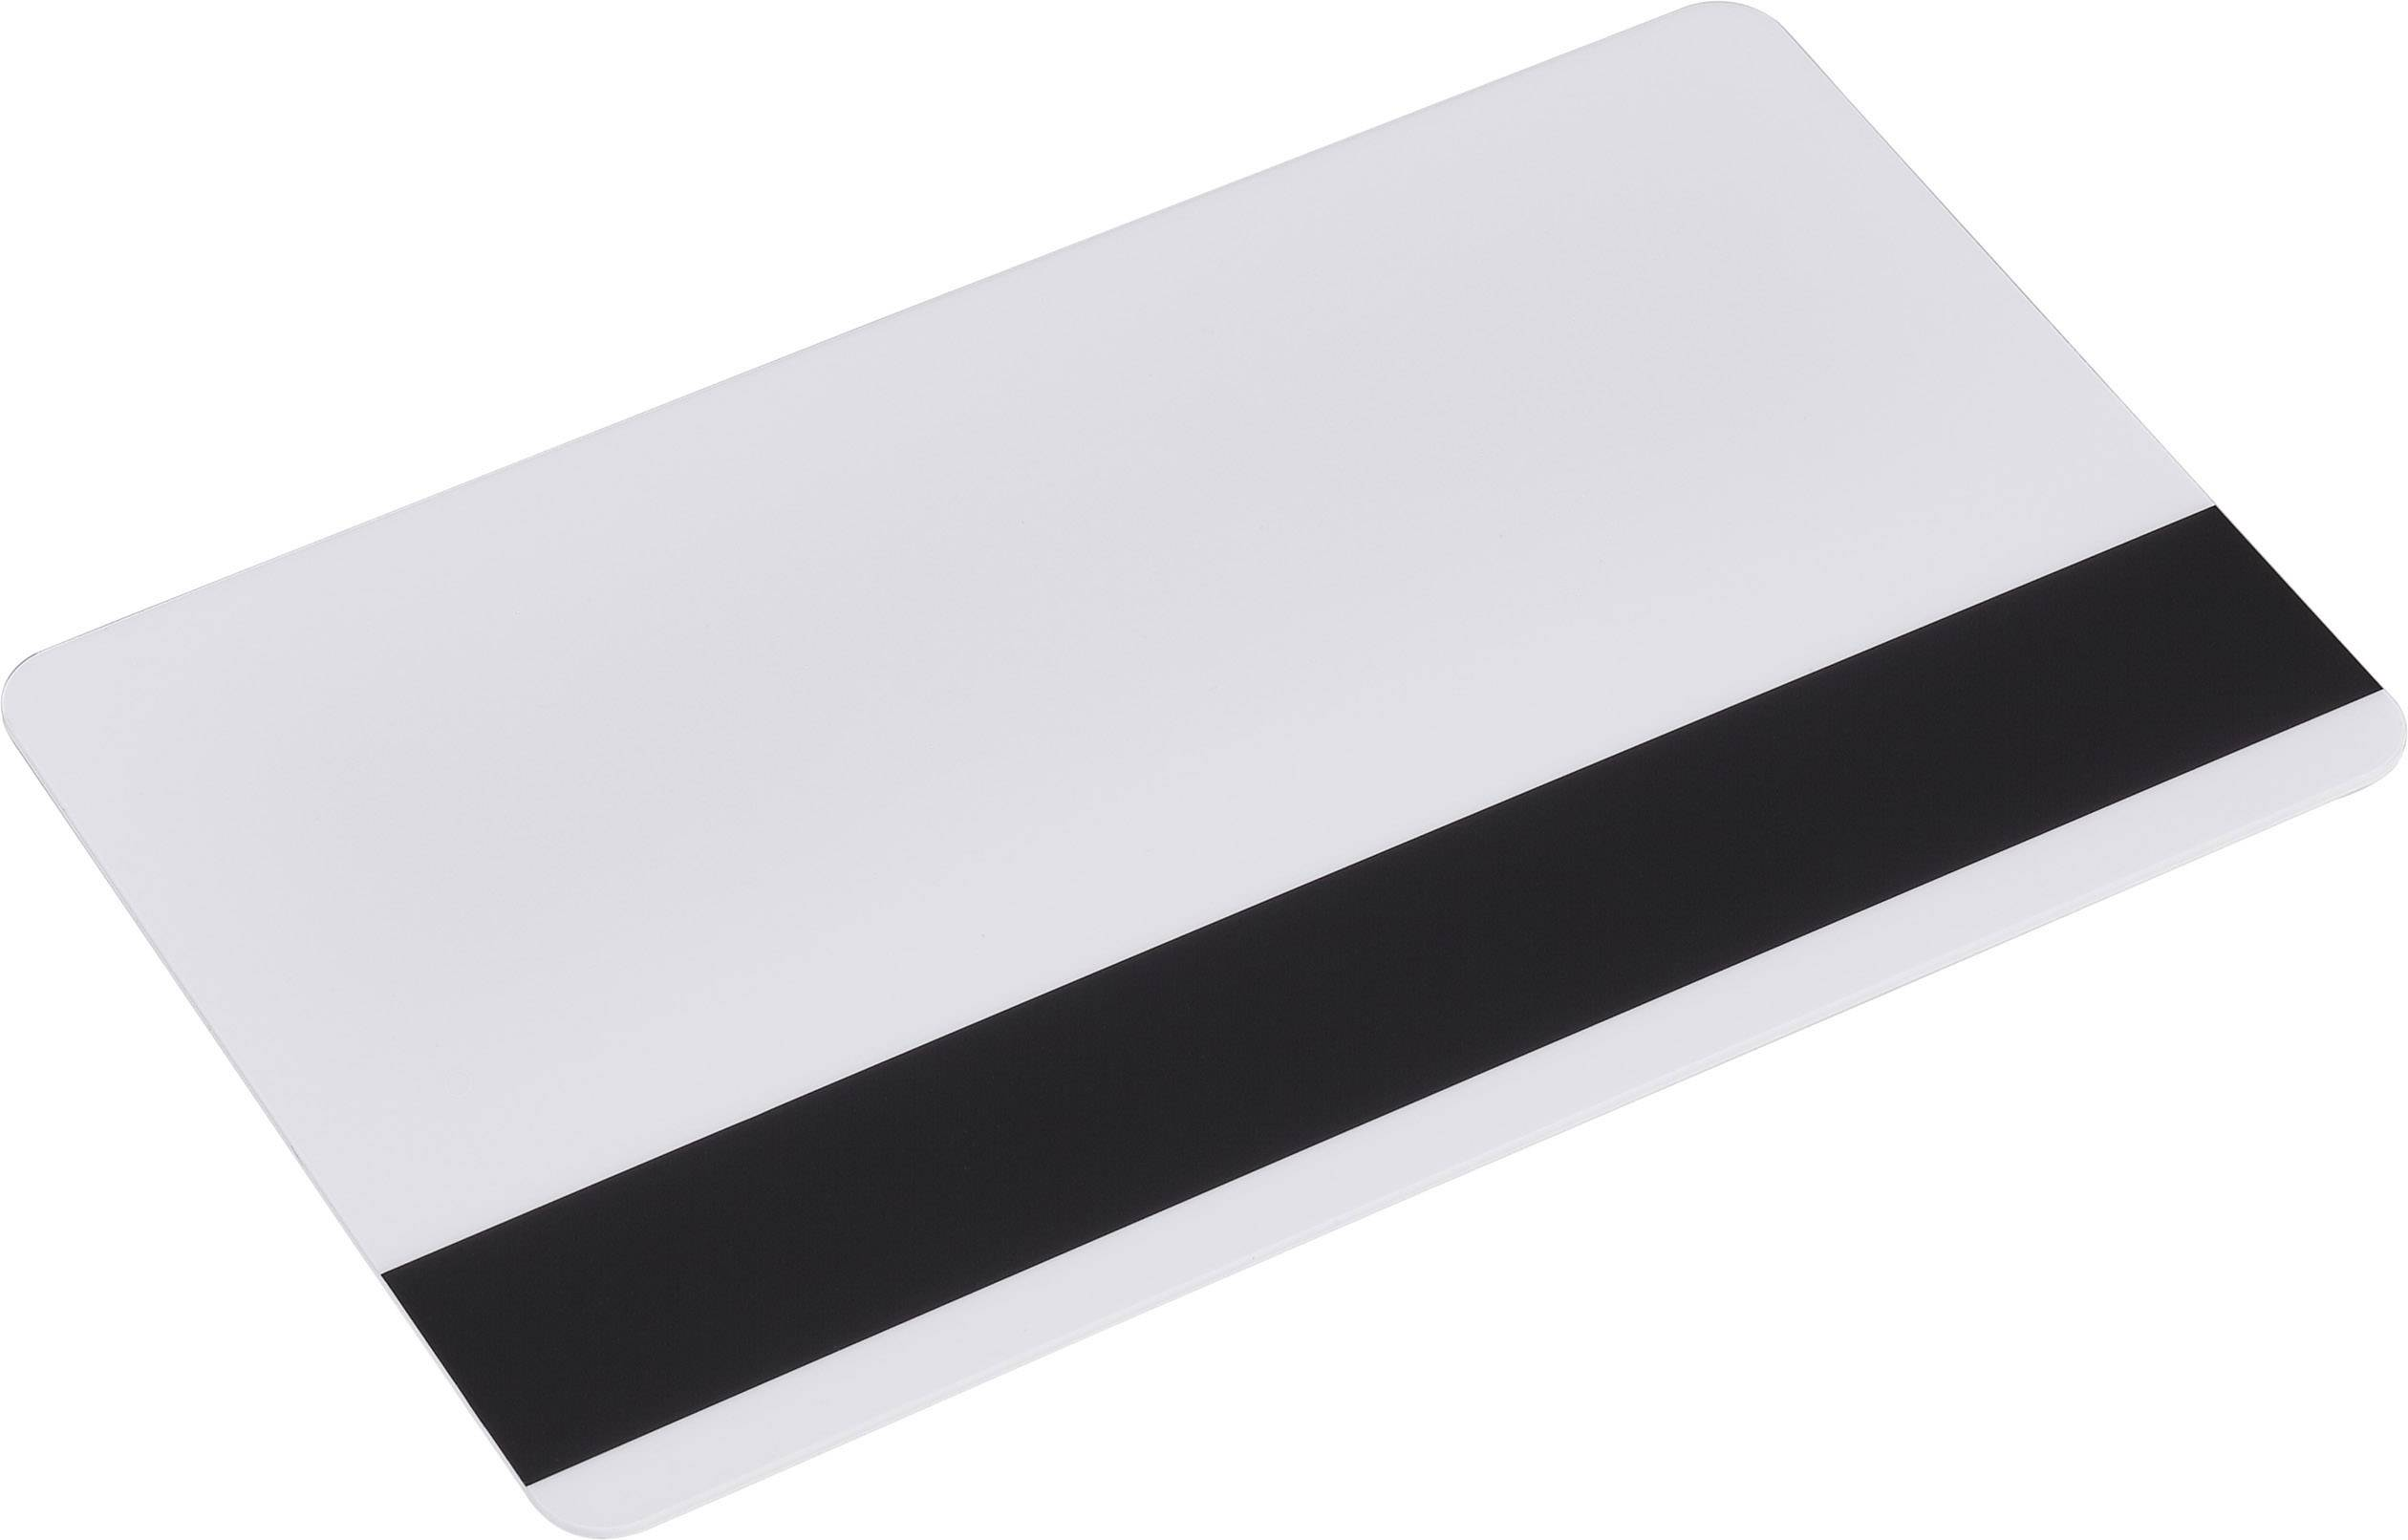 Technika chipových a magnetických kariet